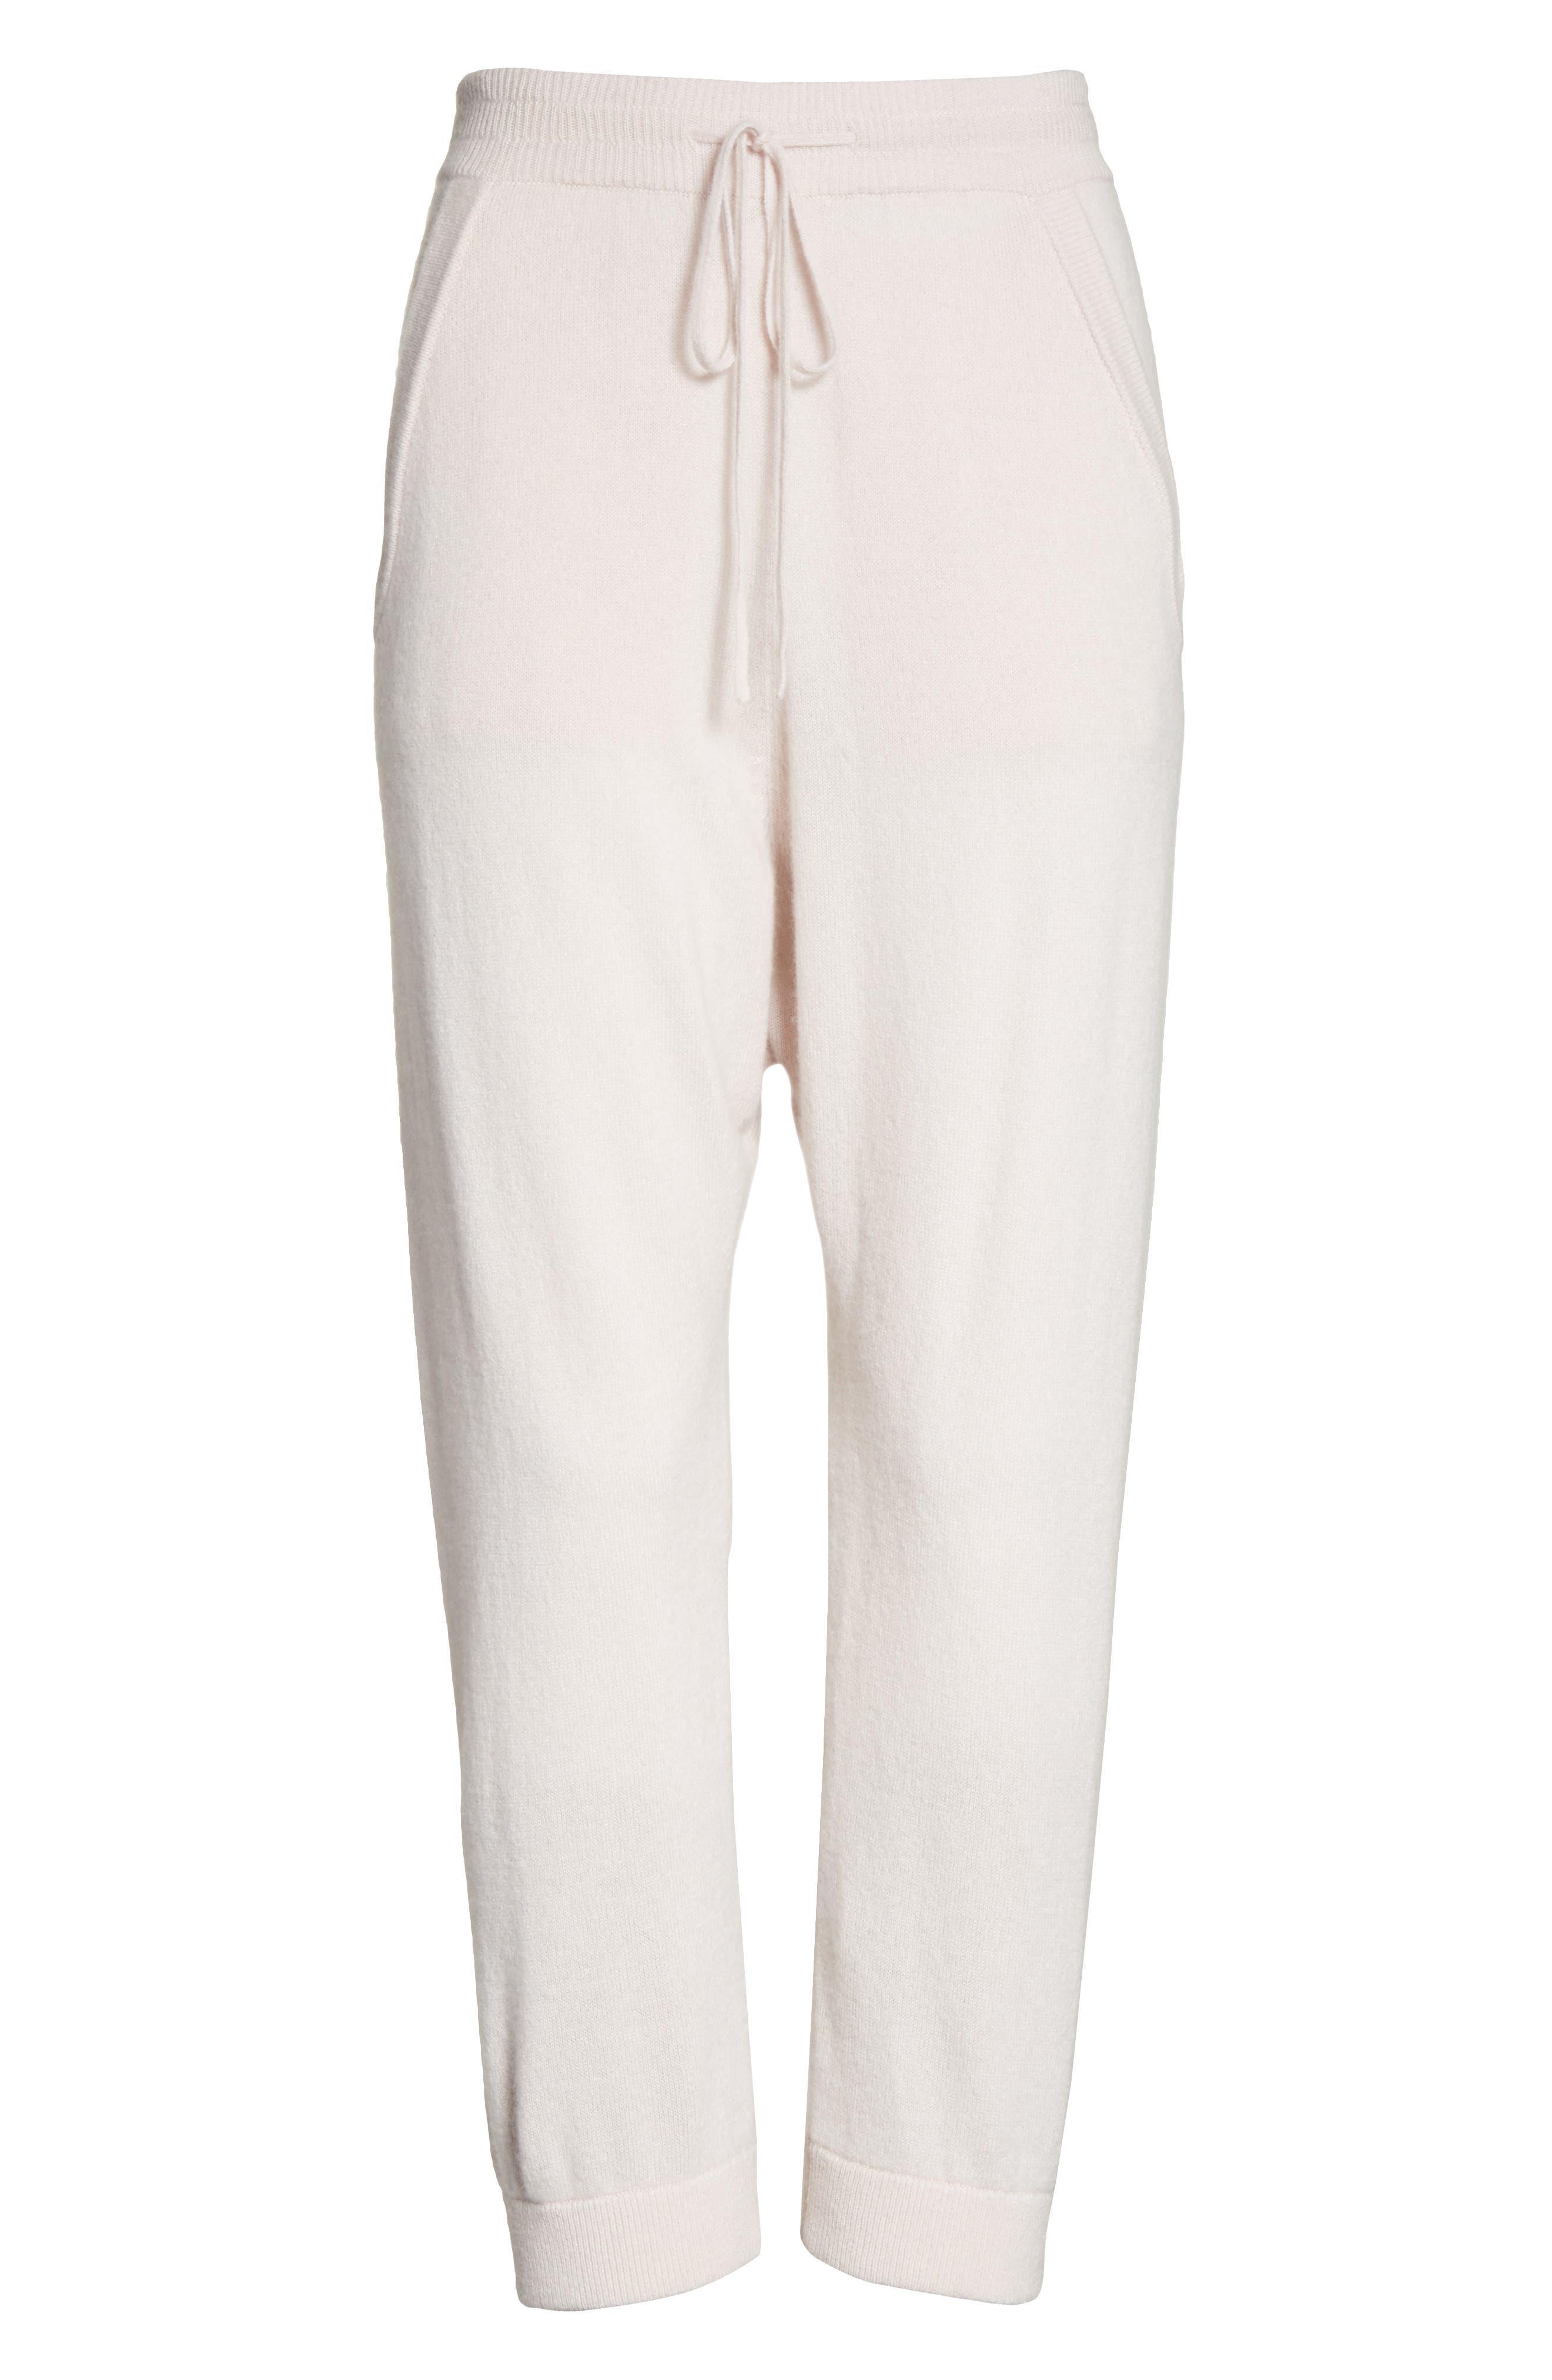 Janina Cashmere Crop Lounge Pants,                             Alternate thumbnail 7, color,                             Blush